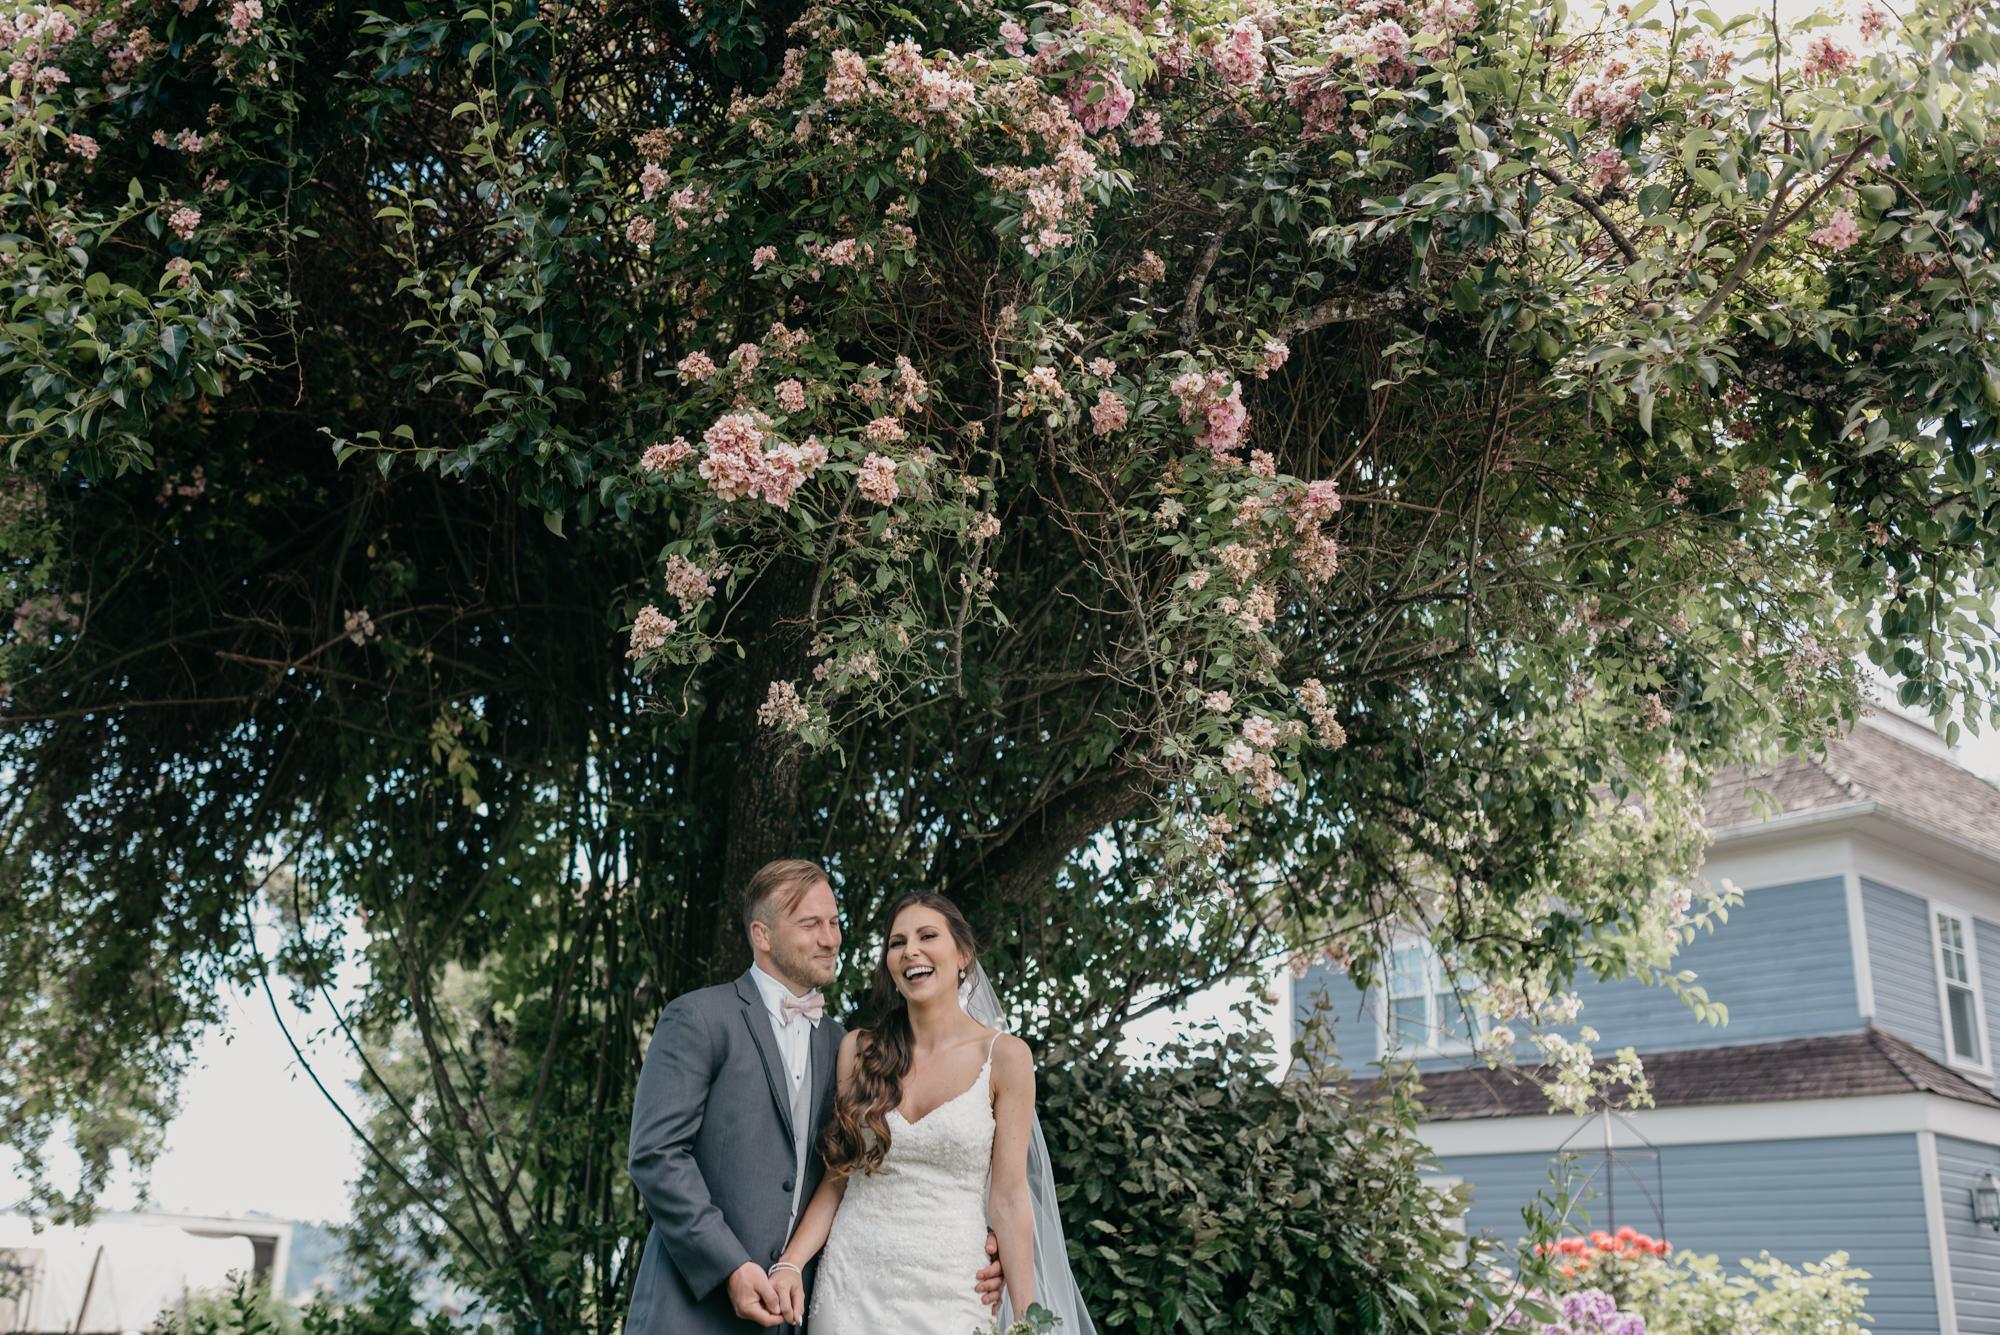 87-lake-oswego-wedding-portland-couple-rose-tree.jpg